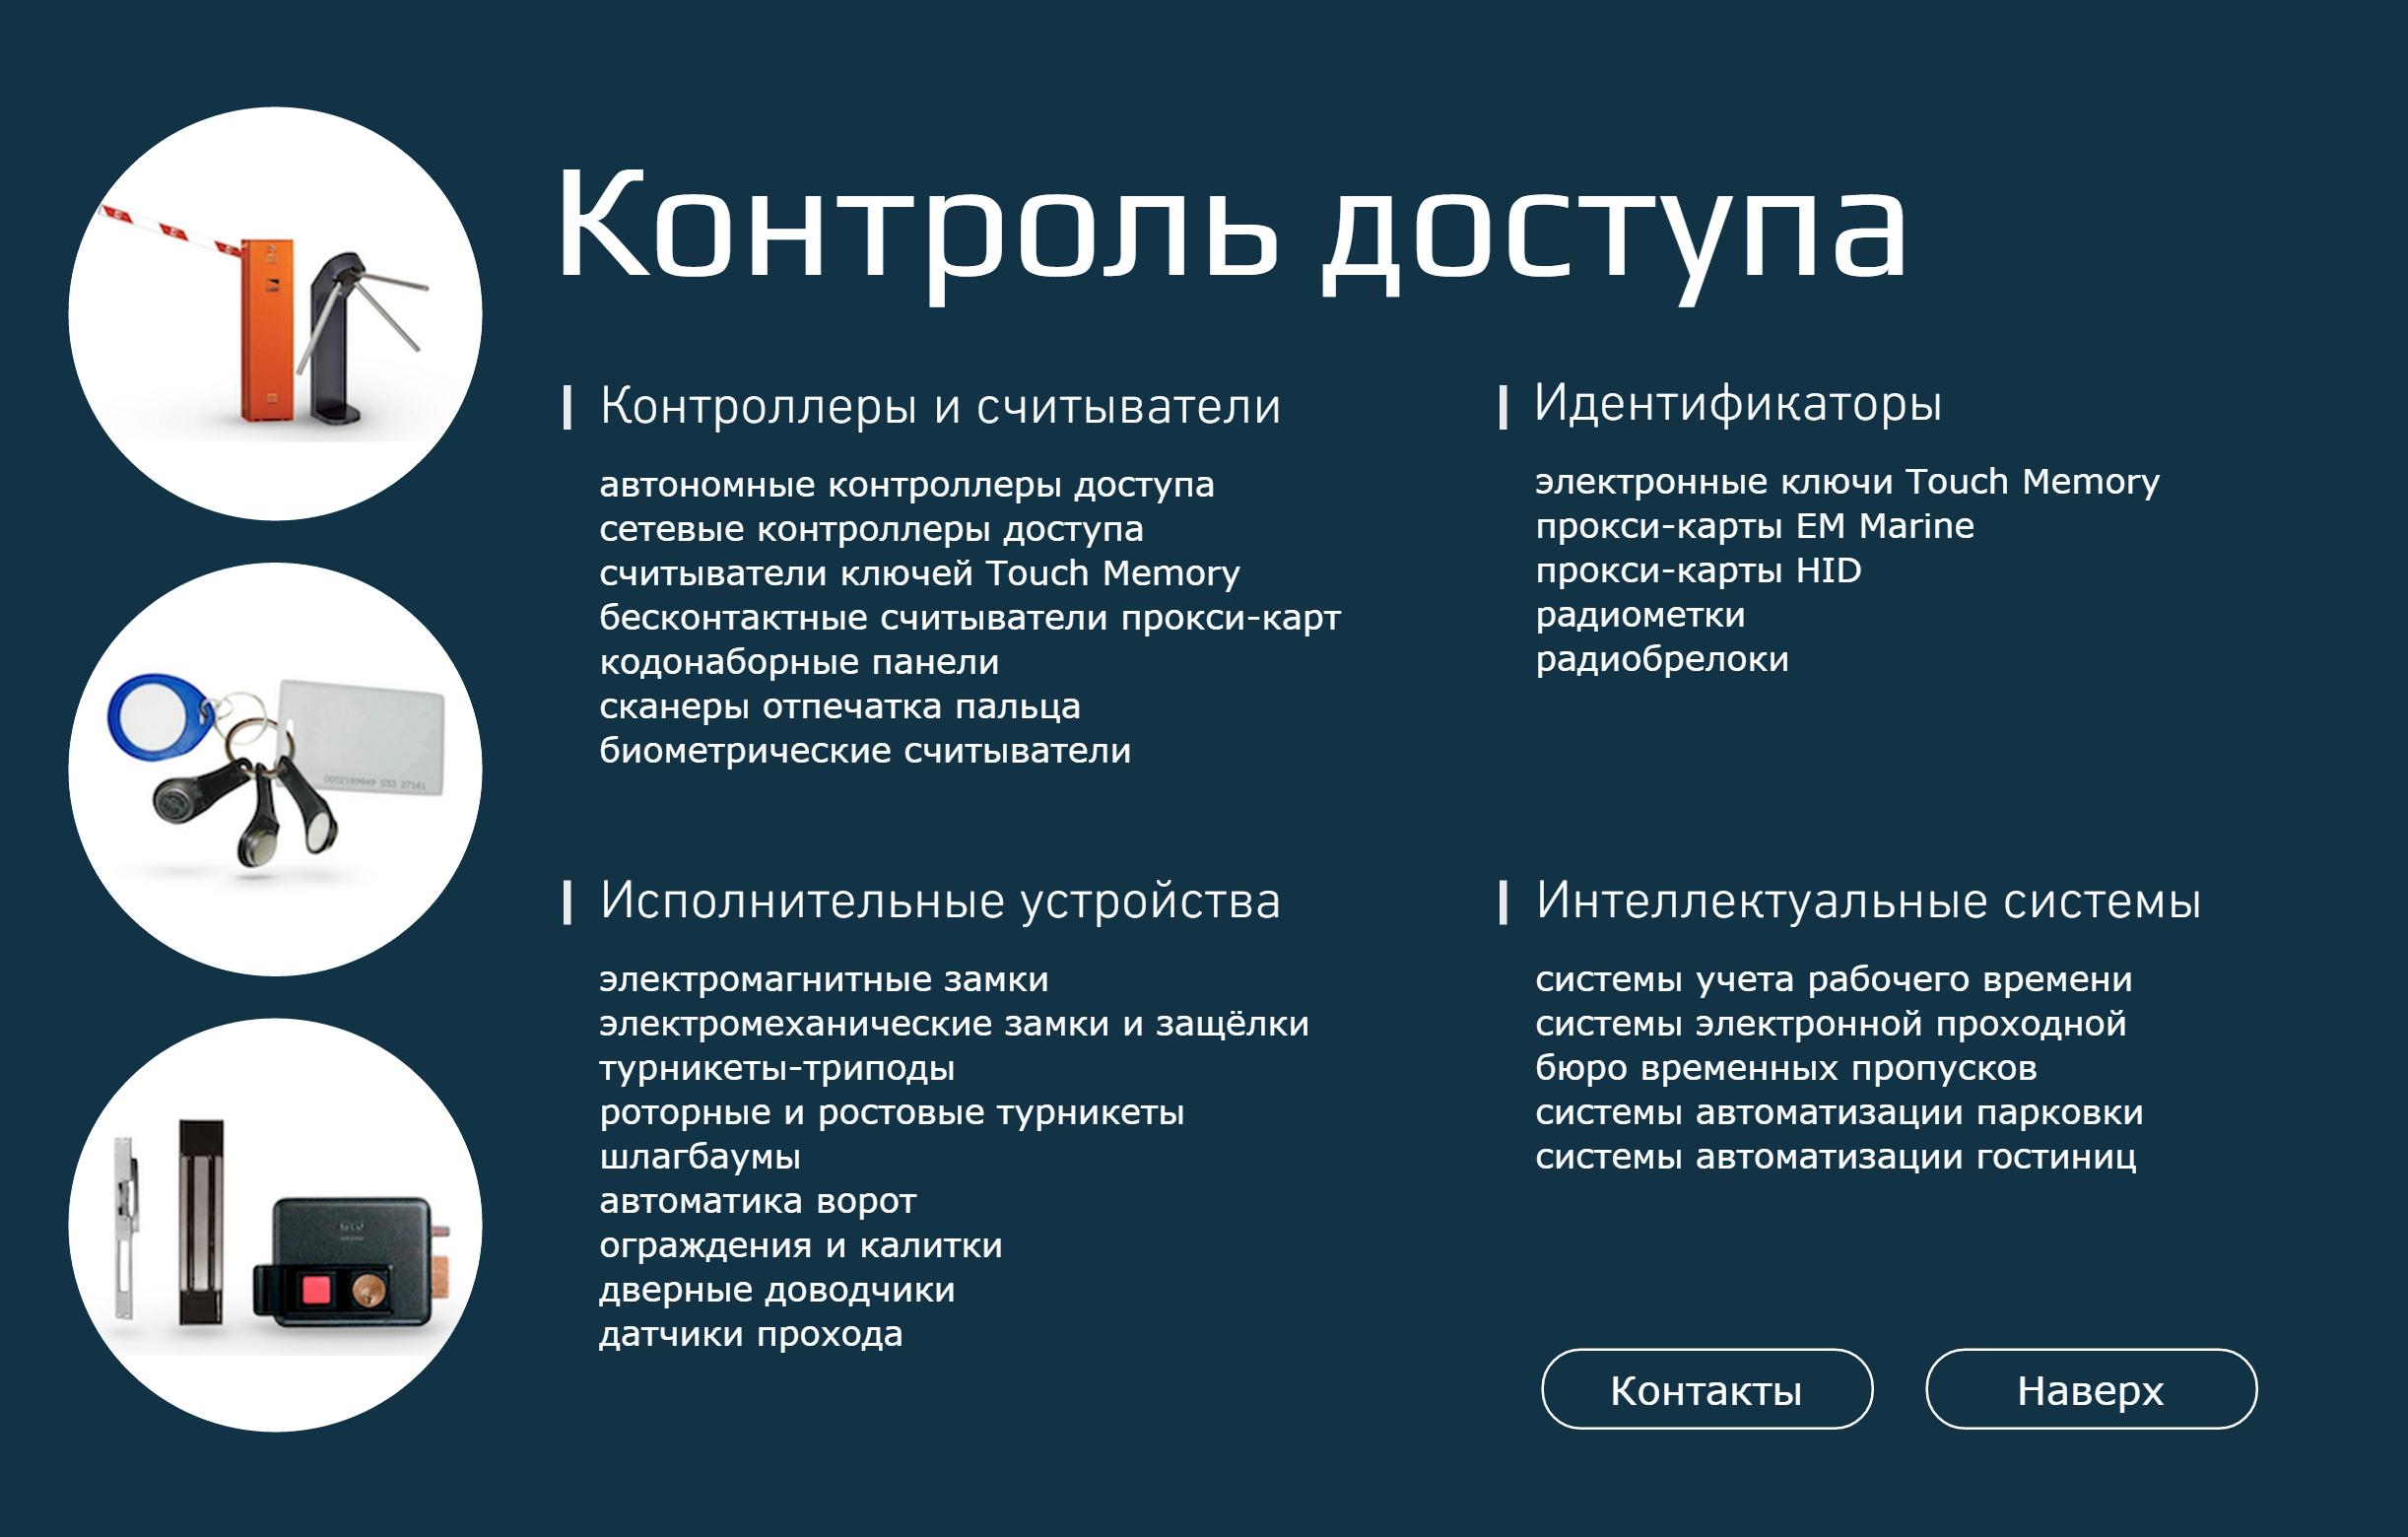 sistema_kontrola_dostupa.jpg